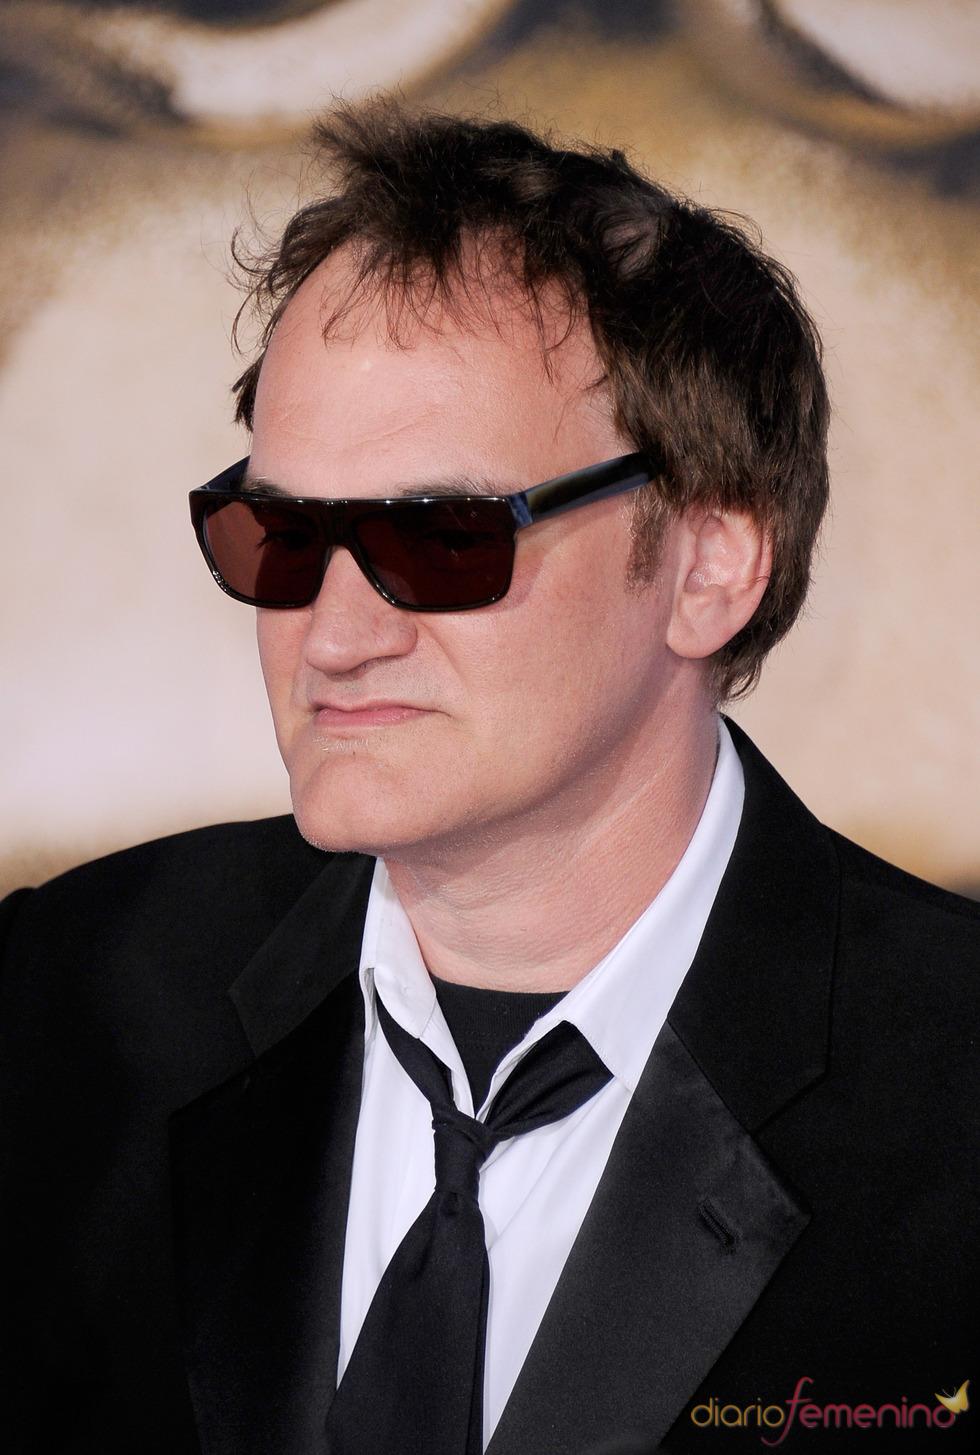 Quentin Tarantino acude junto a los Duques de Cambridge a la gala 'BAFTA Brits to Watch'